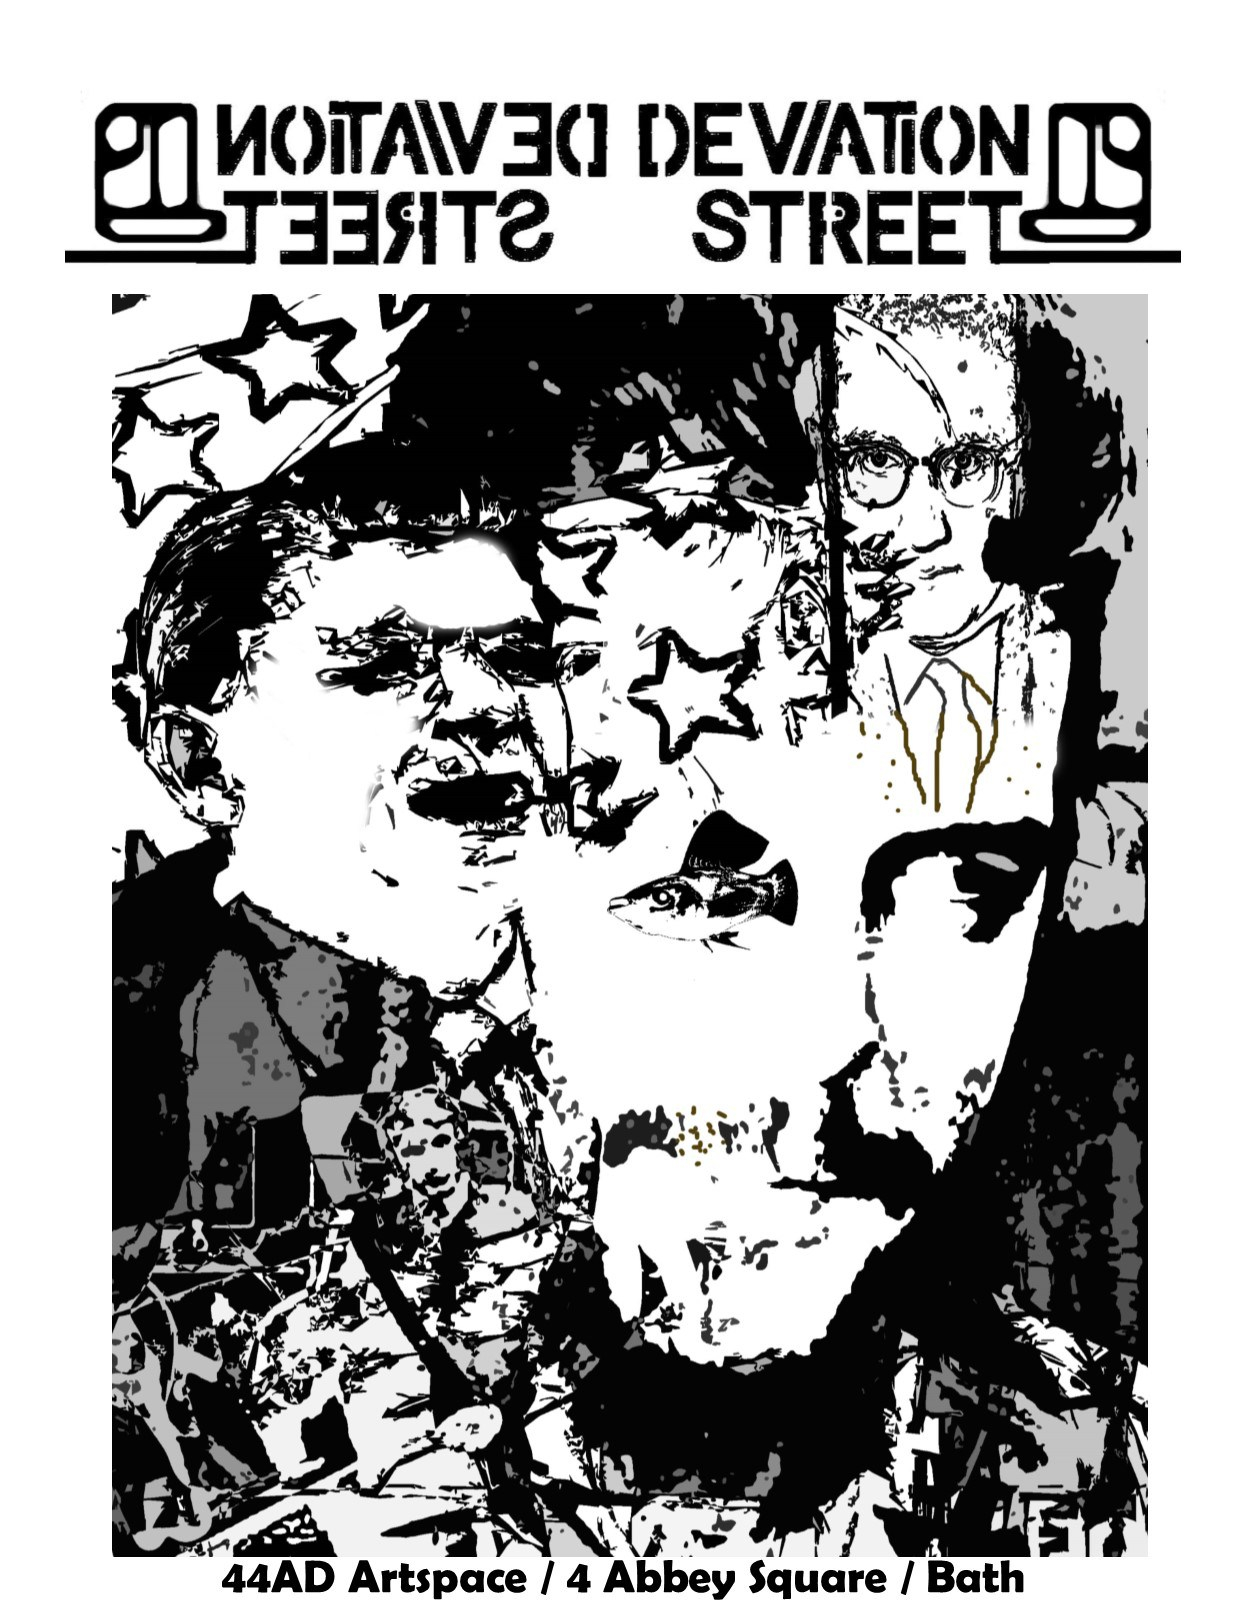 Deviation Street Poster 2018